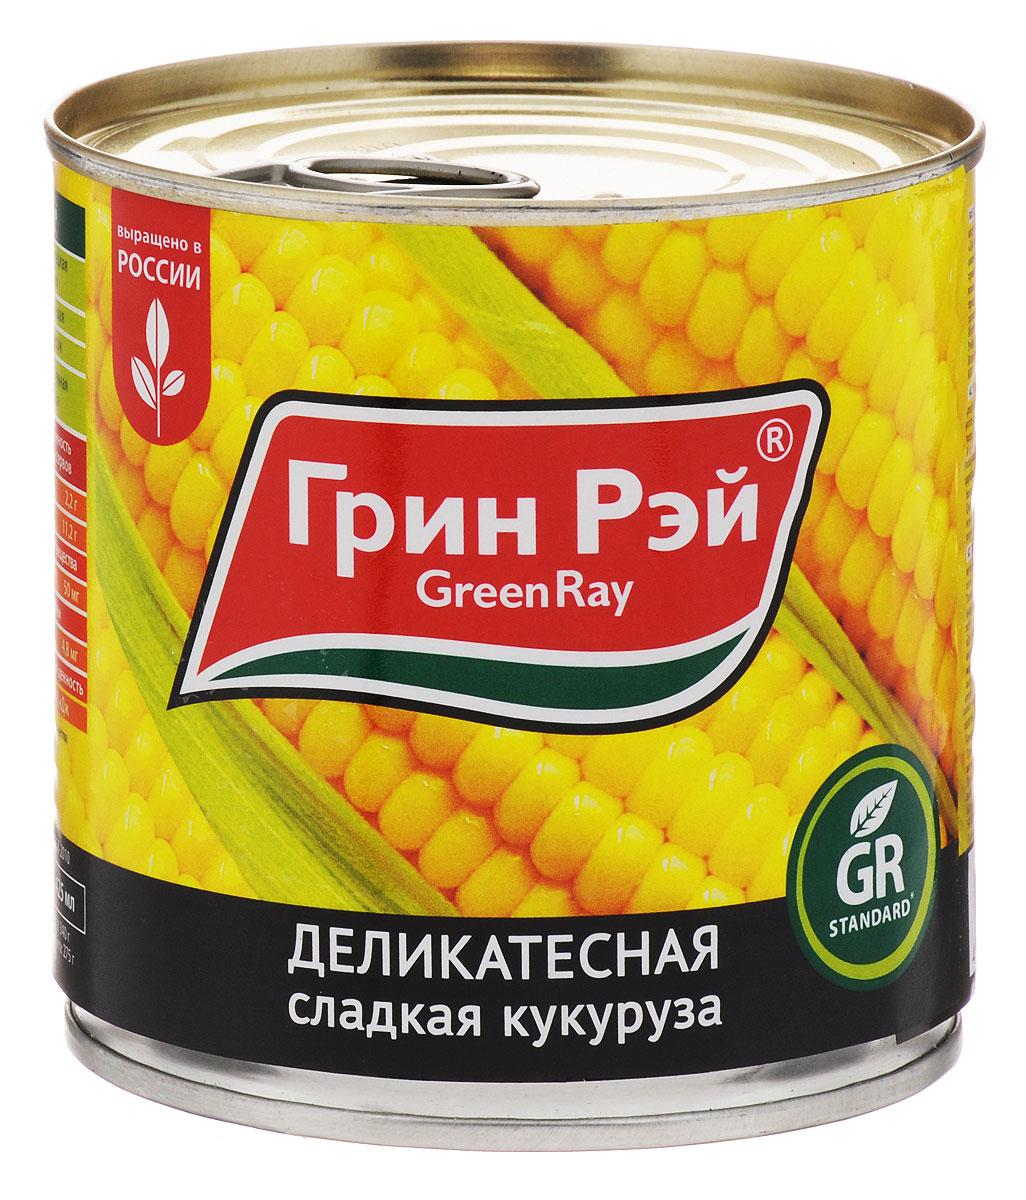 Green Ray деликатесная сладкая кукуруза, 425 мл bonduelle кукуруза сладкая 340 г